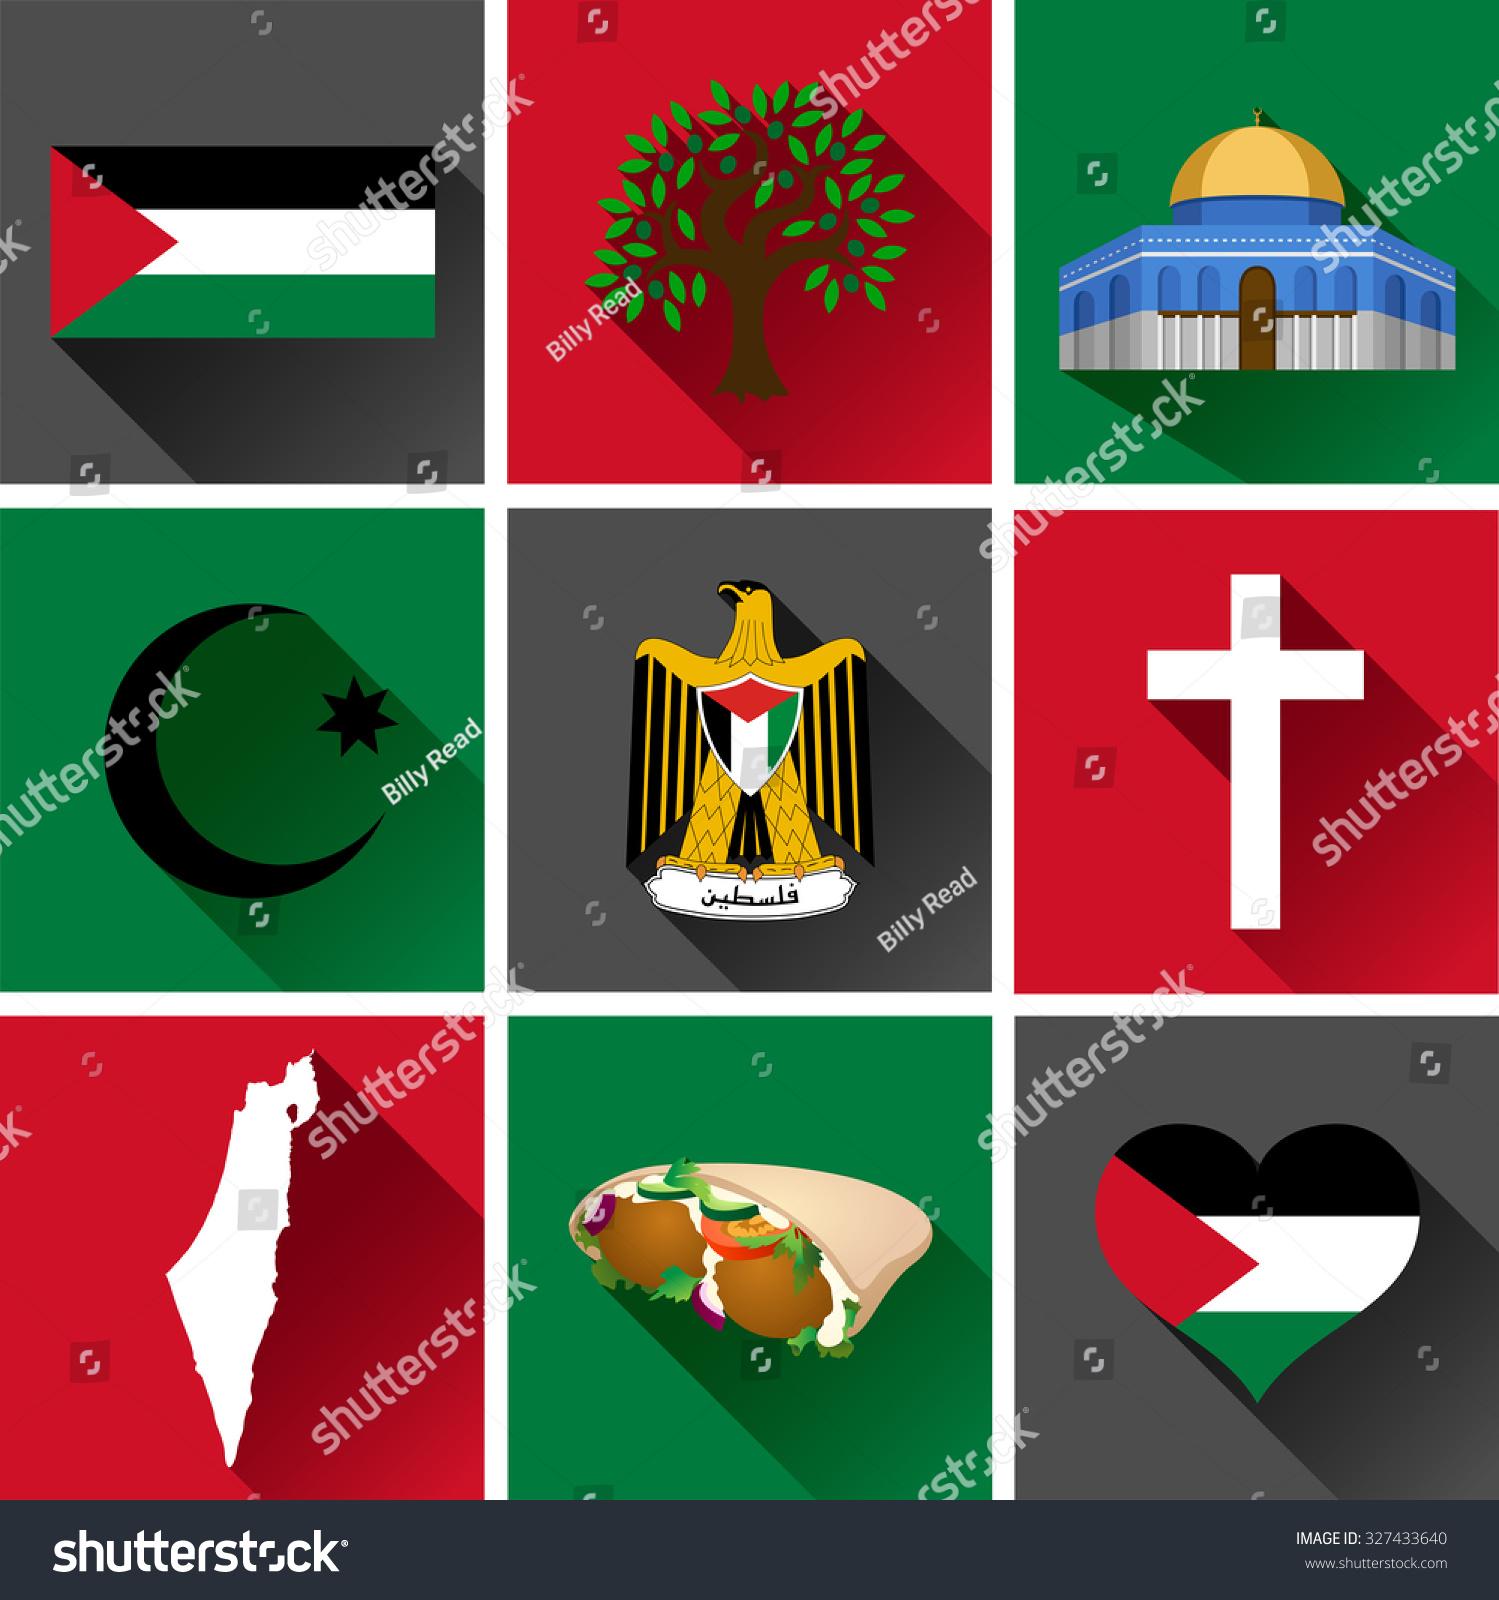 download путешествие по святой земле иерусалим и палестина самария алилея